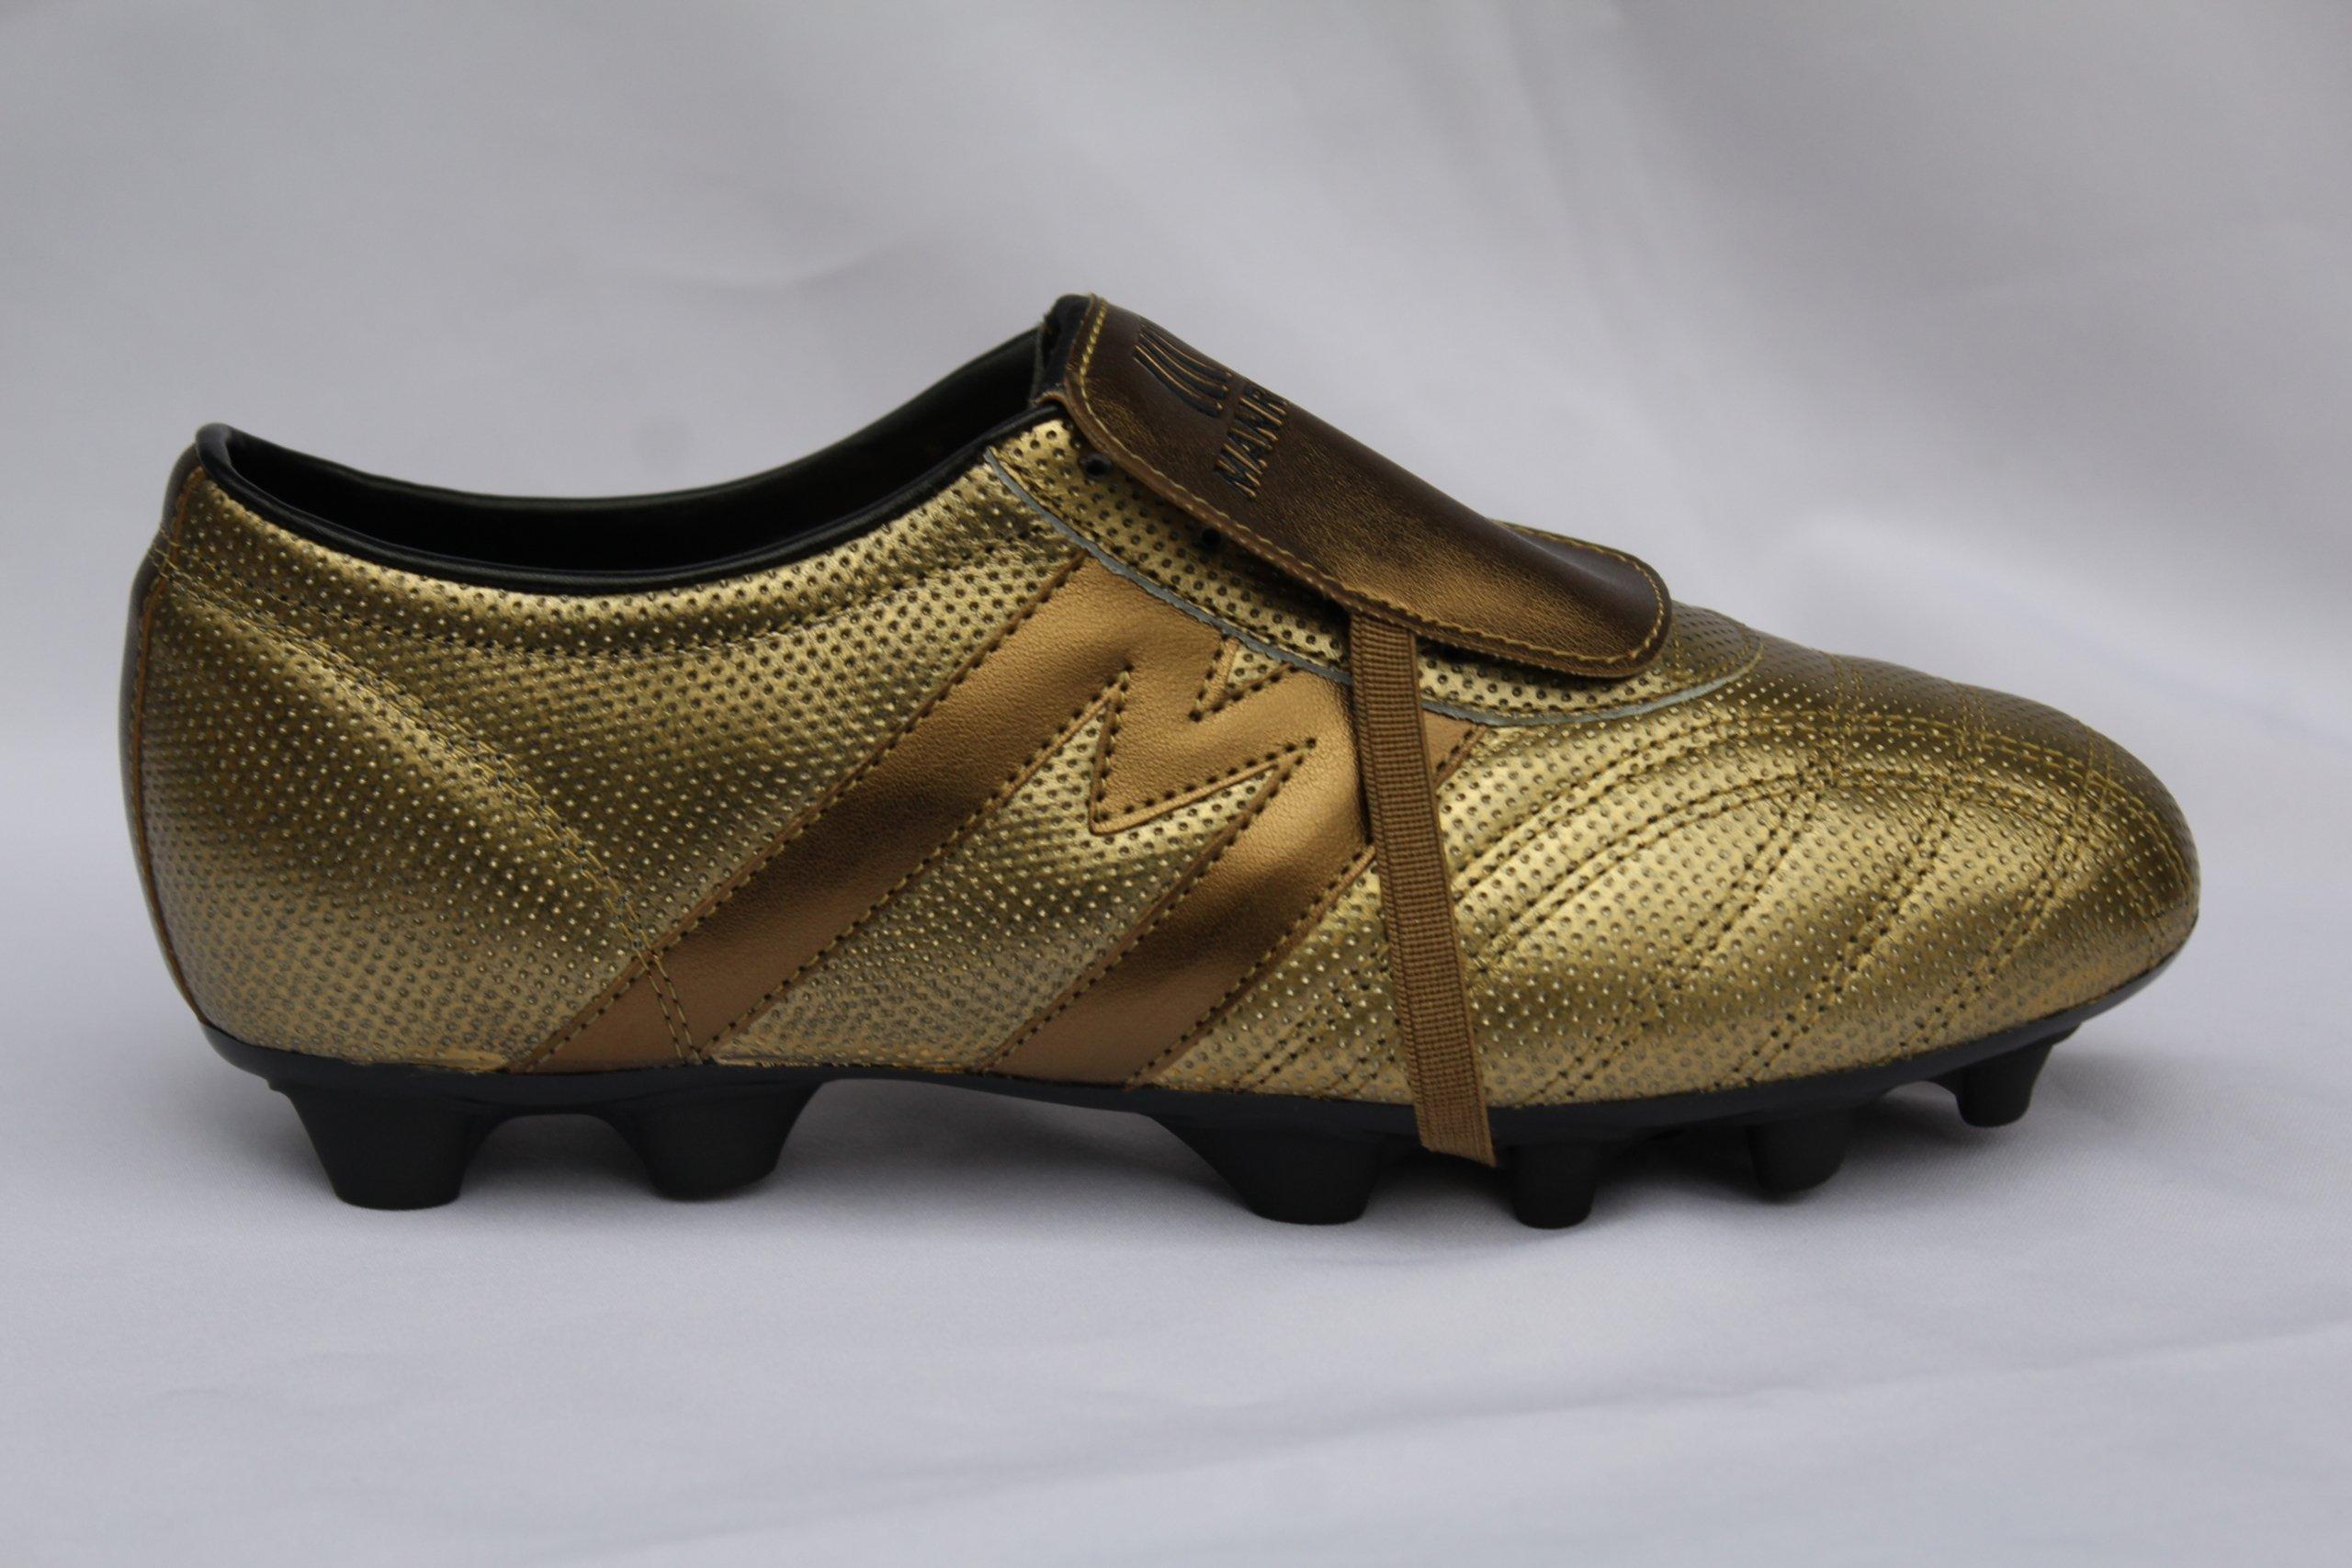 2267-Zapato de fútbol profesional marca Manríquez mod. MID SX color dorado con negro